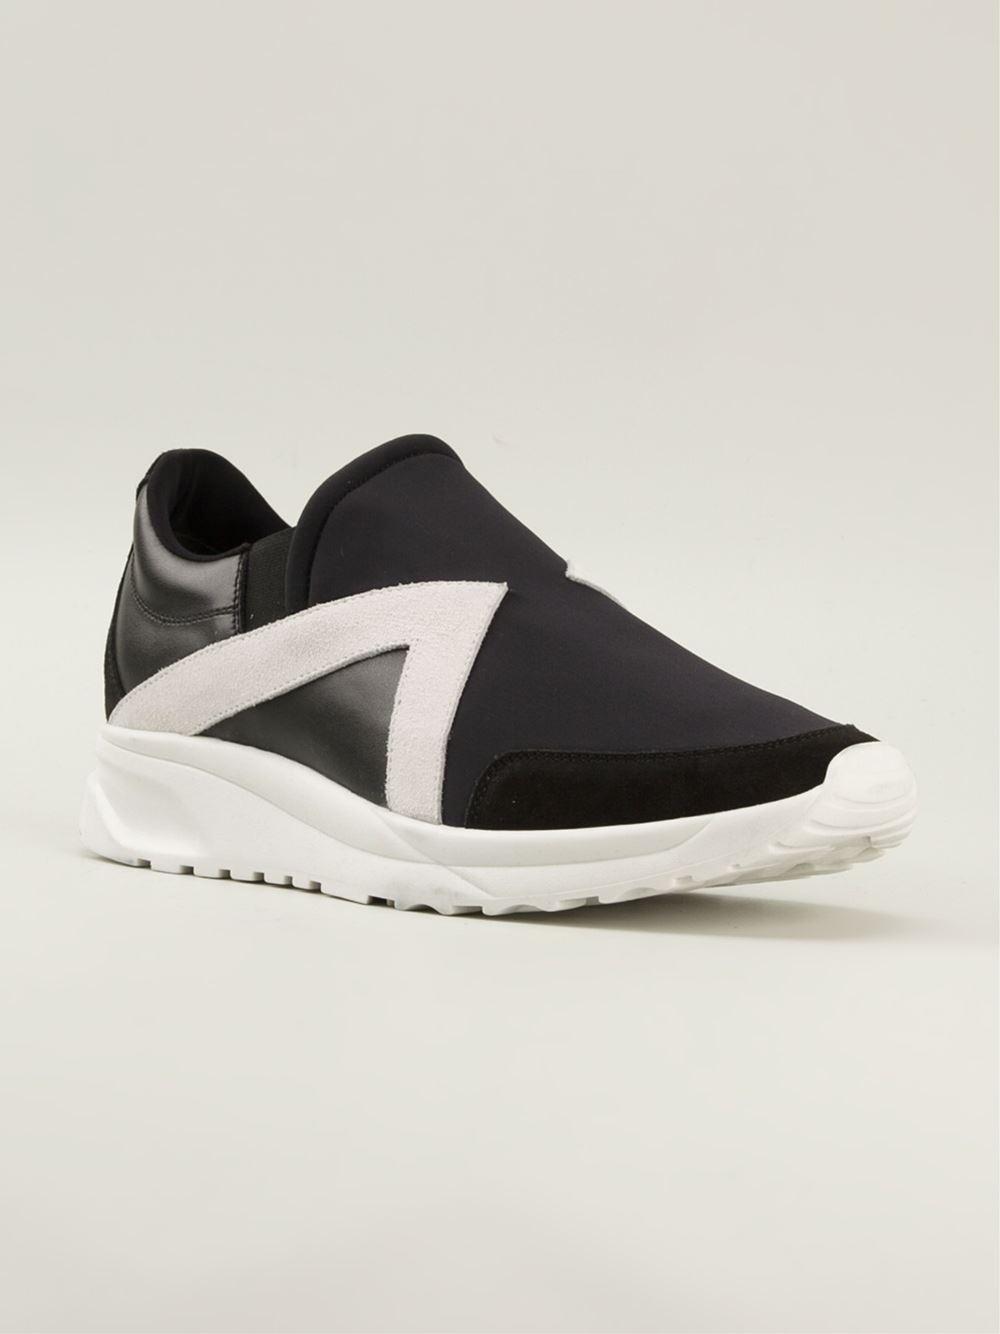 Neil BarrettRunner sneakers 0dEmL